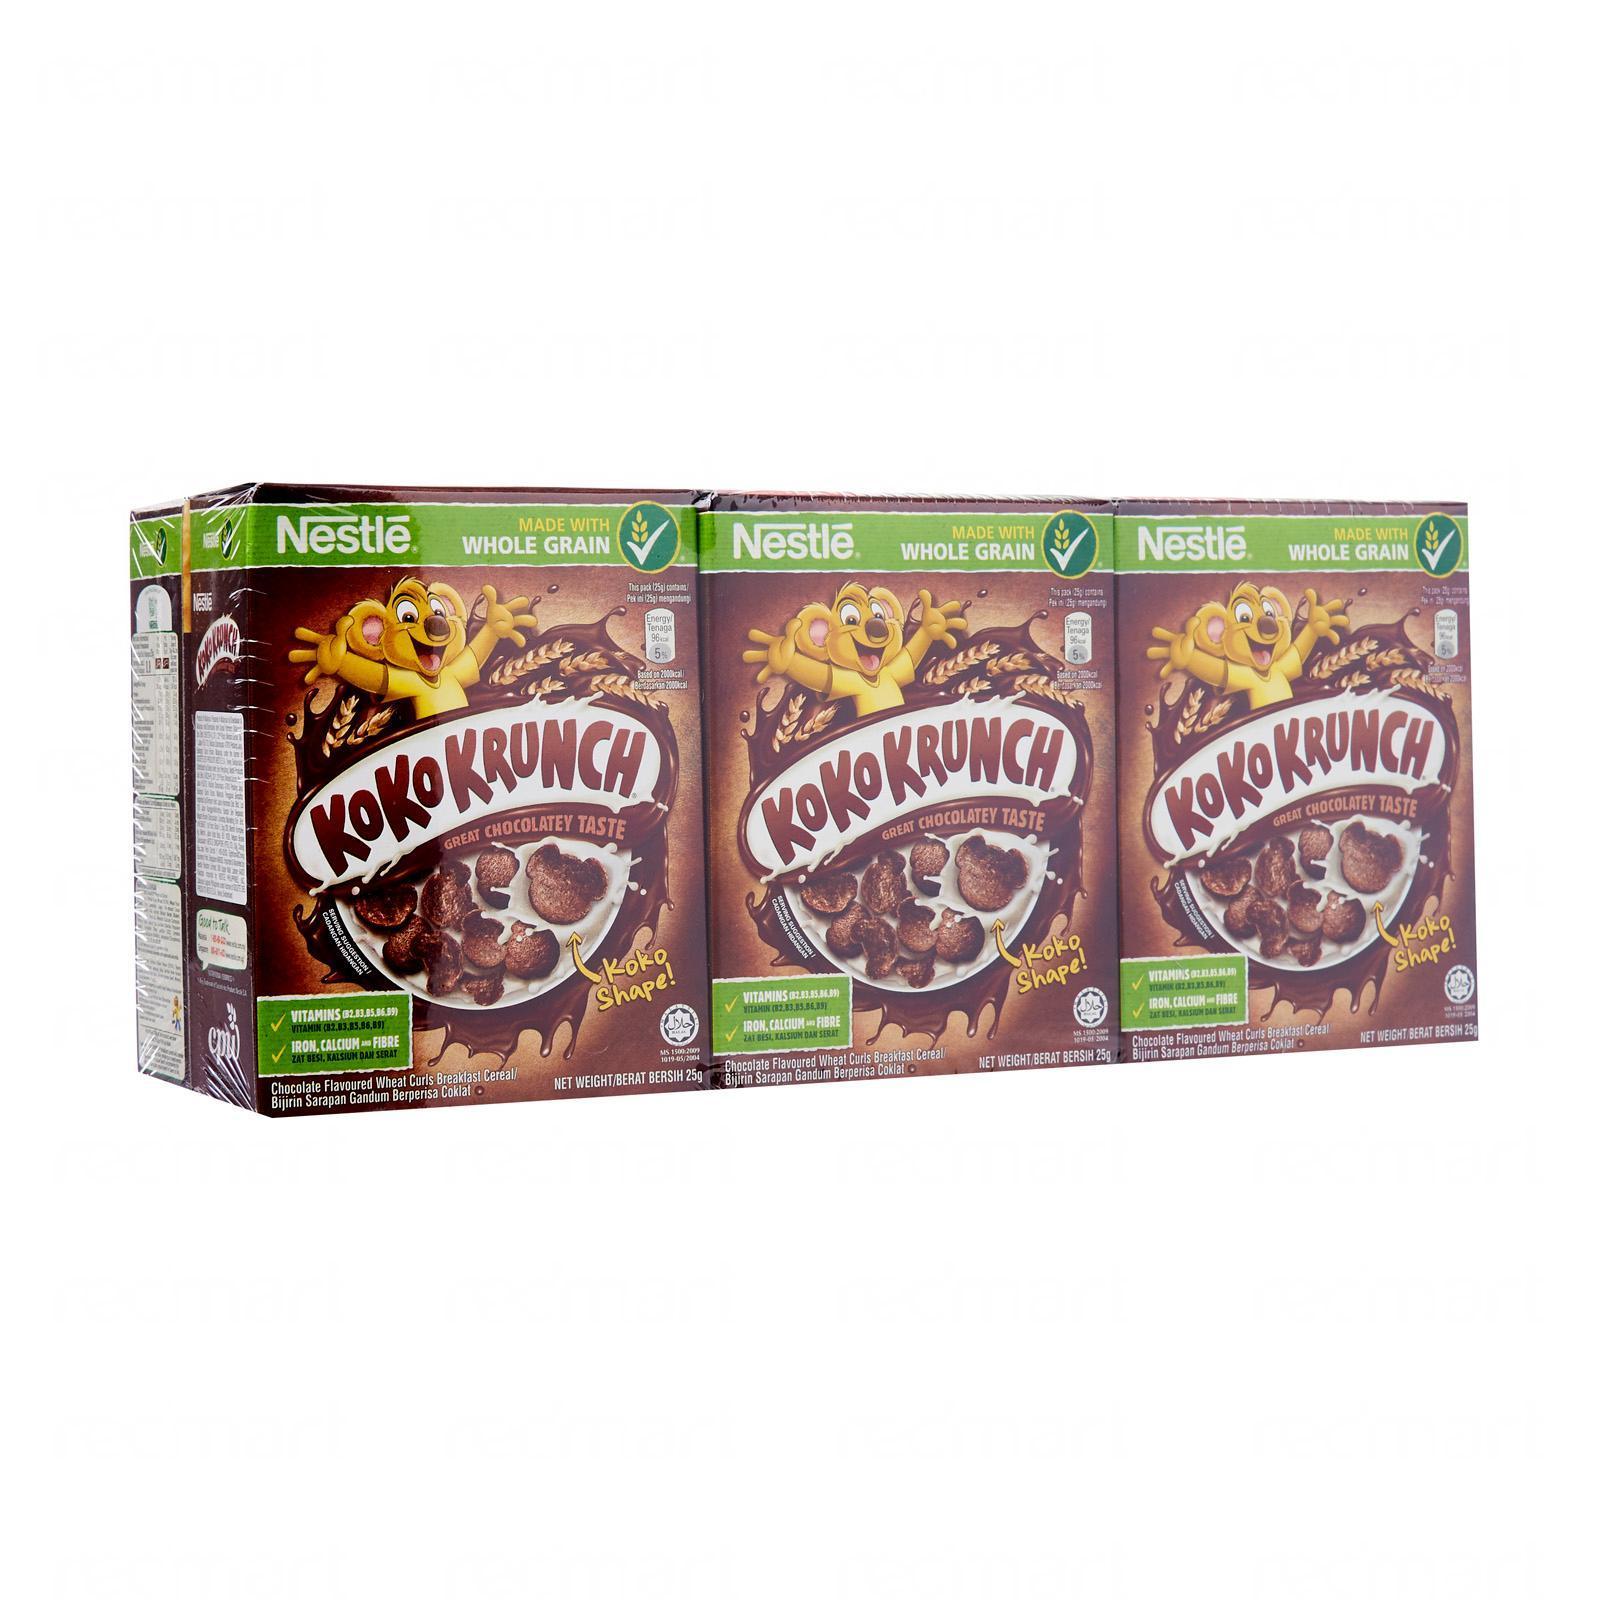 Nestle Koko Krunch Cereal Multipack By Redmart.